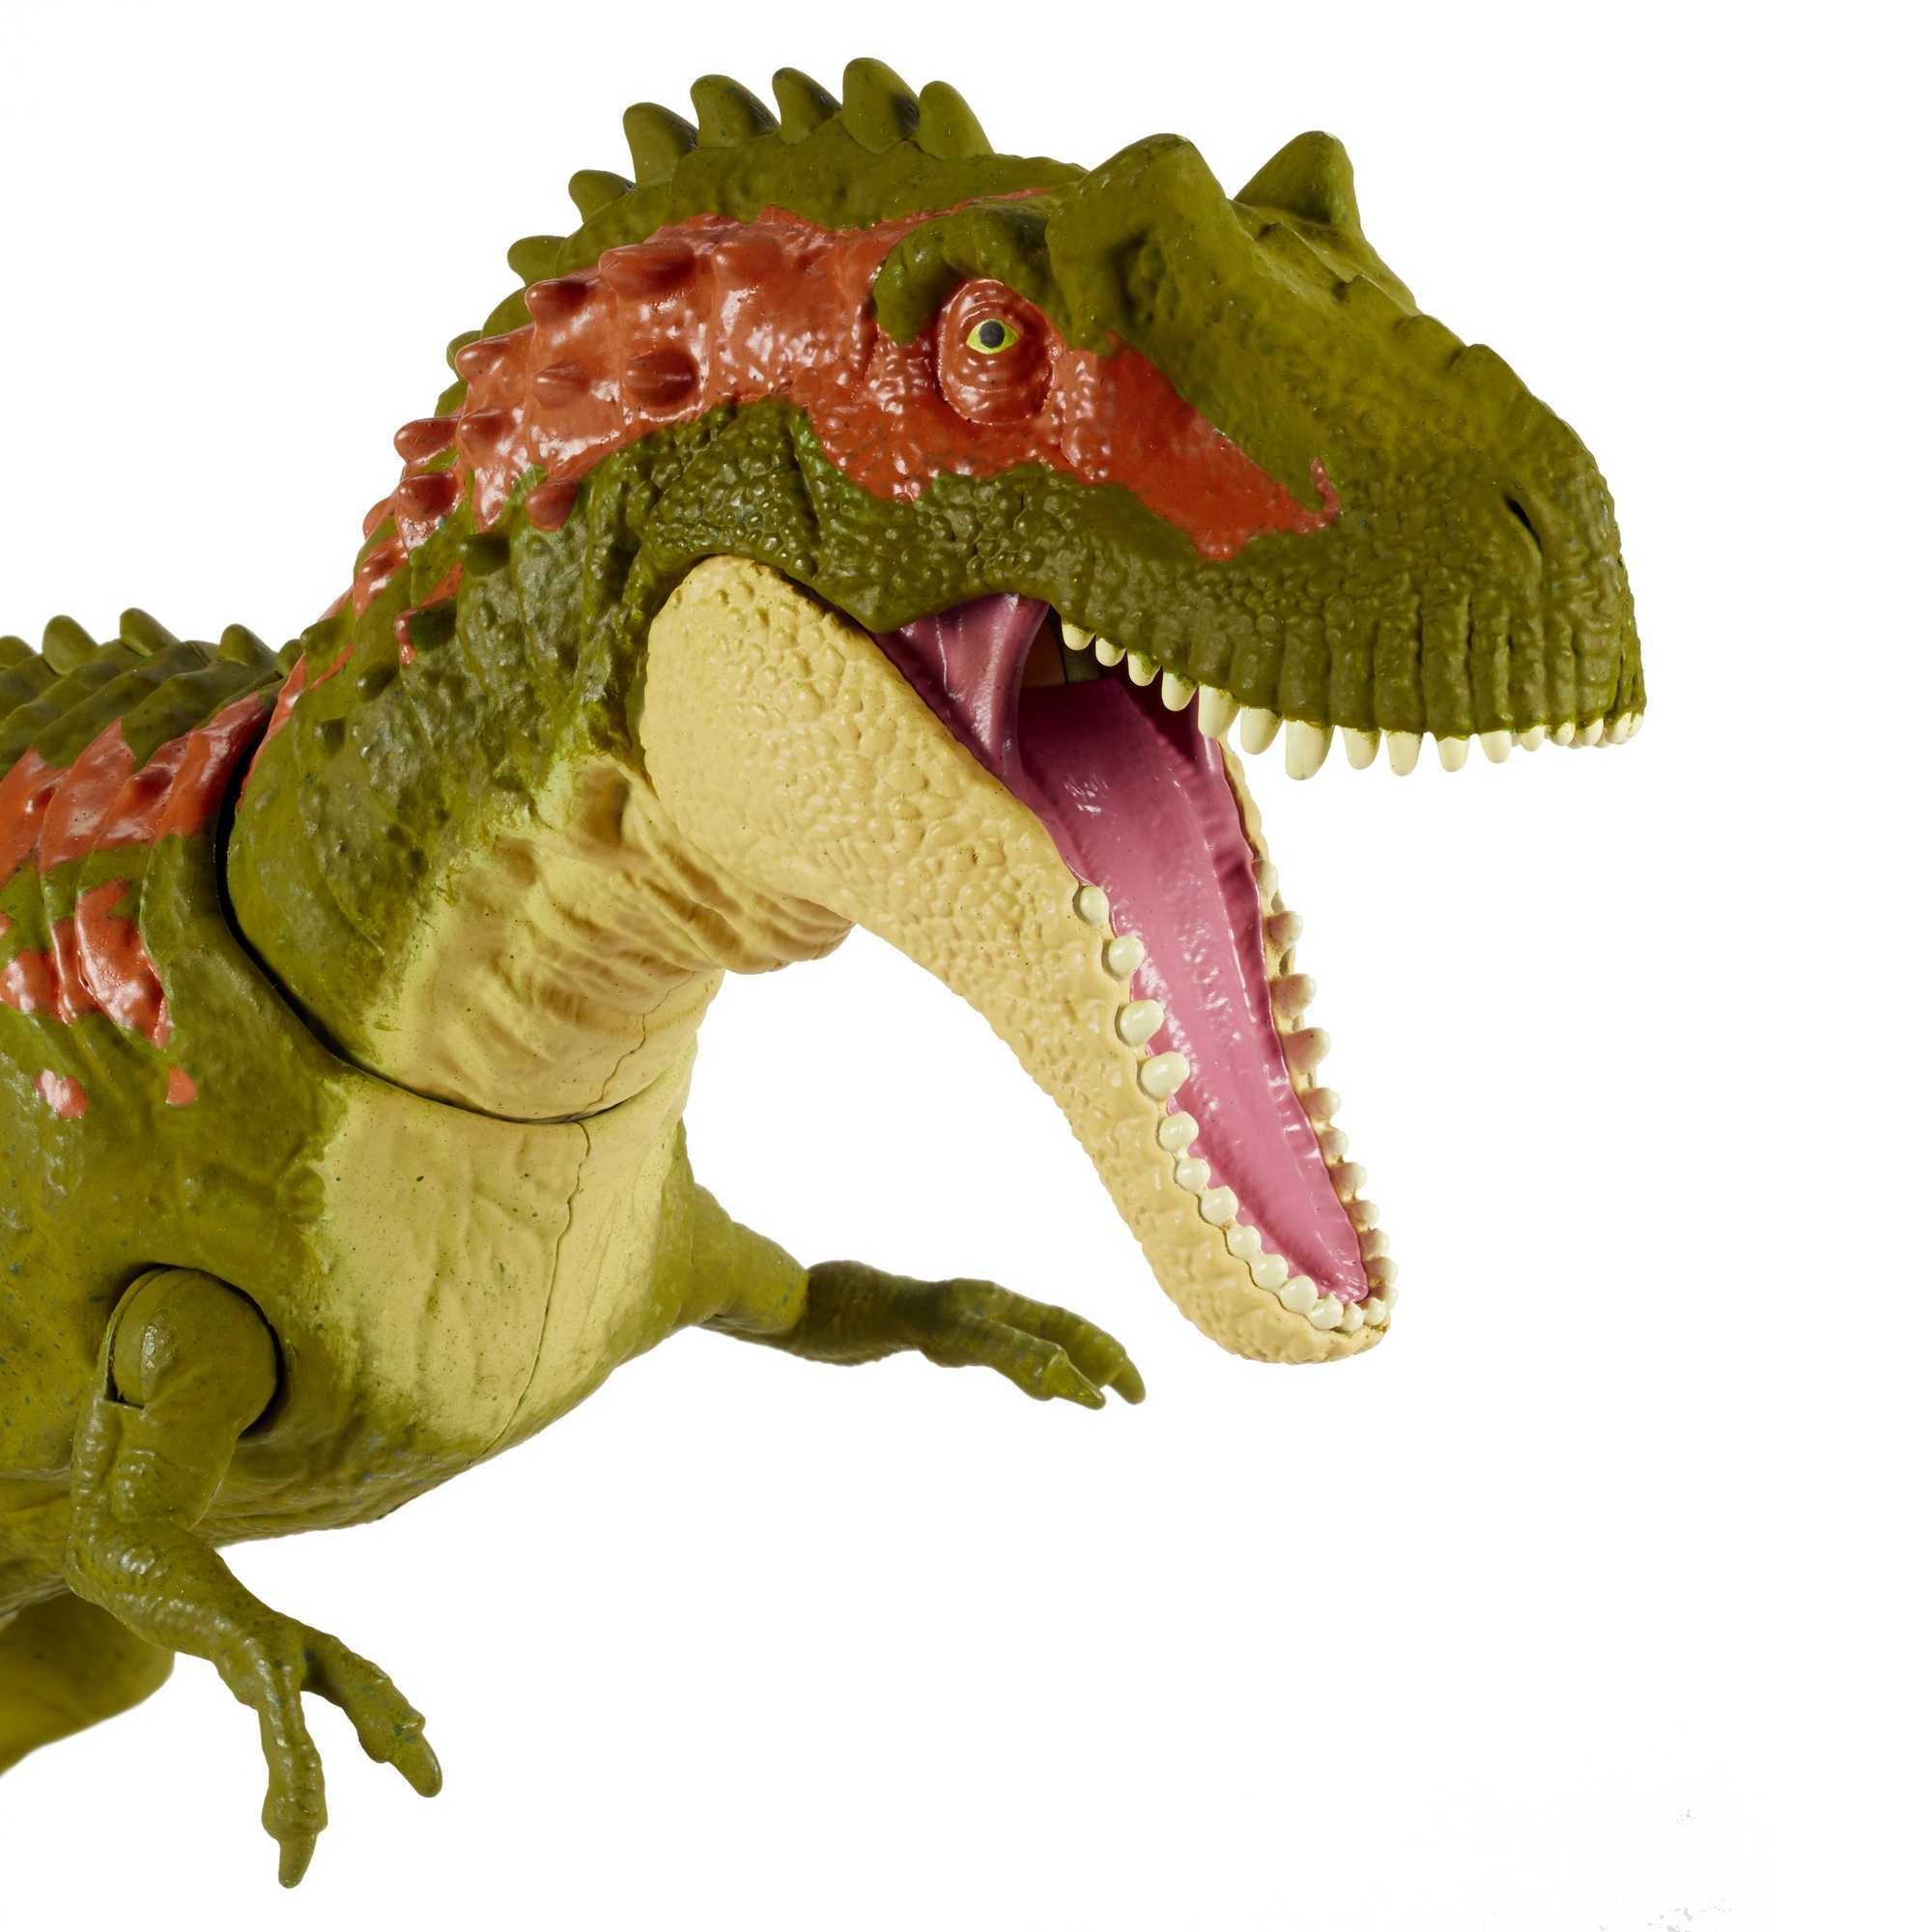 Jurassic World: Mega szczęki - Albertozaur (GJP32/GVG67)